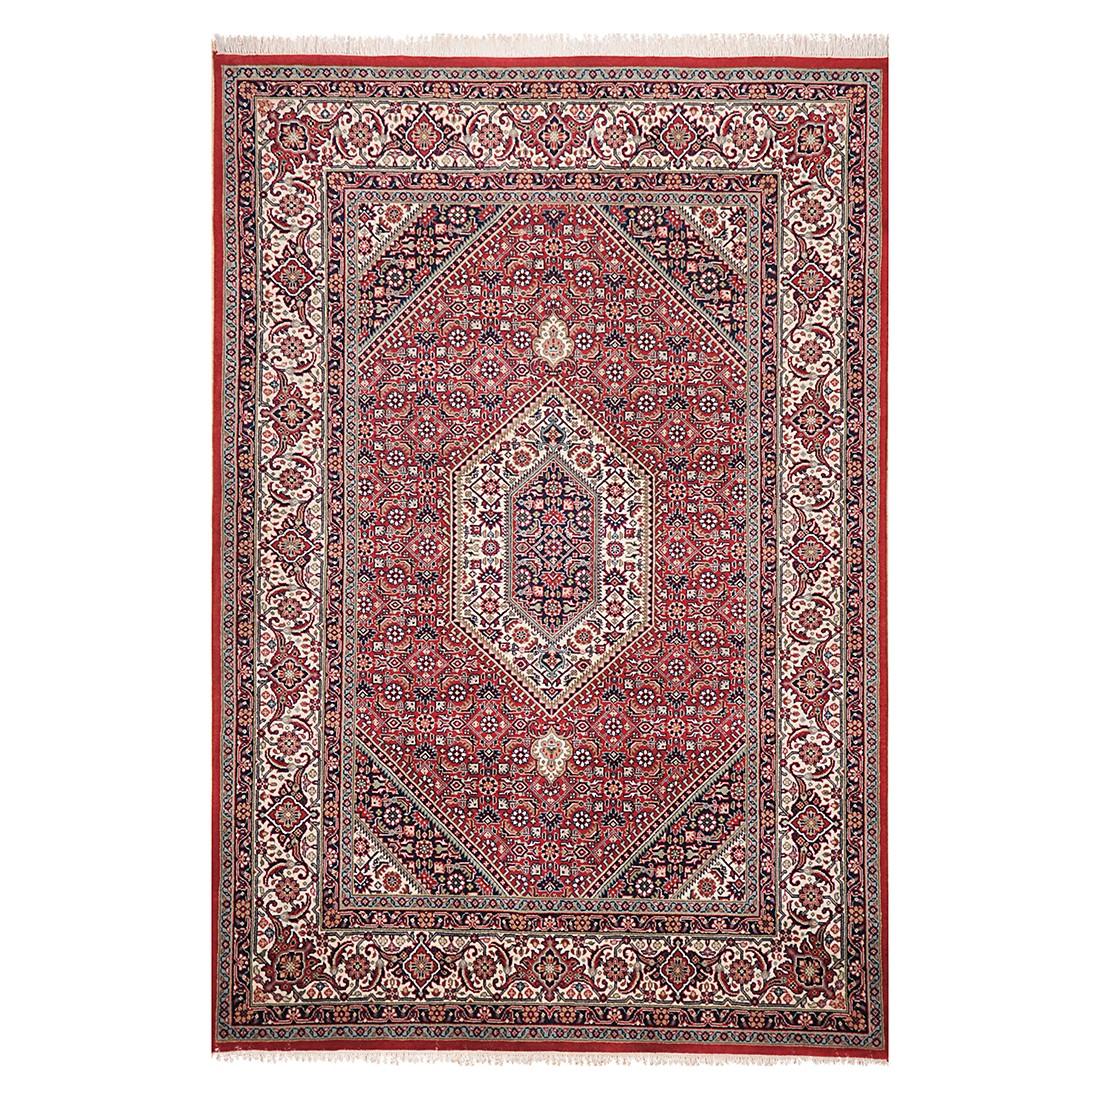 Teppich Sirsa Seta Bidjar - Seide/Rot - 170 cm x 240 cm, Theko die markenteppiche